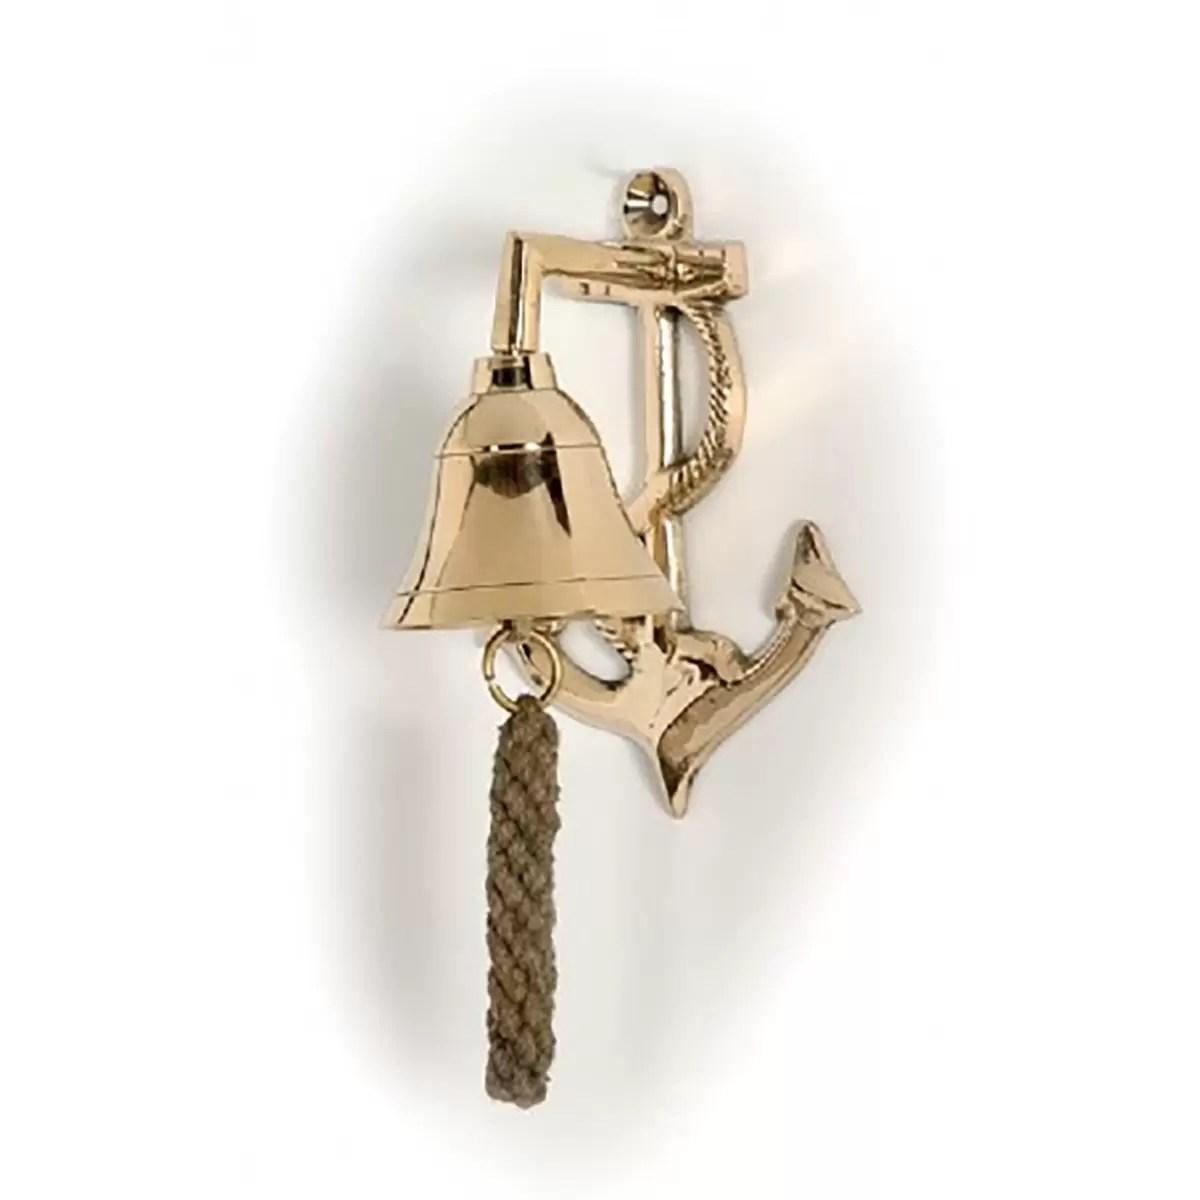 Réz hajóharang horgonytartón 8,5cm Harang